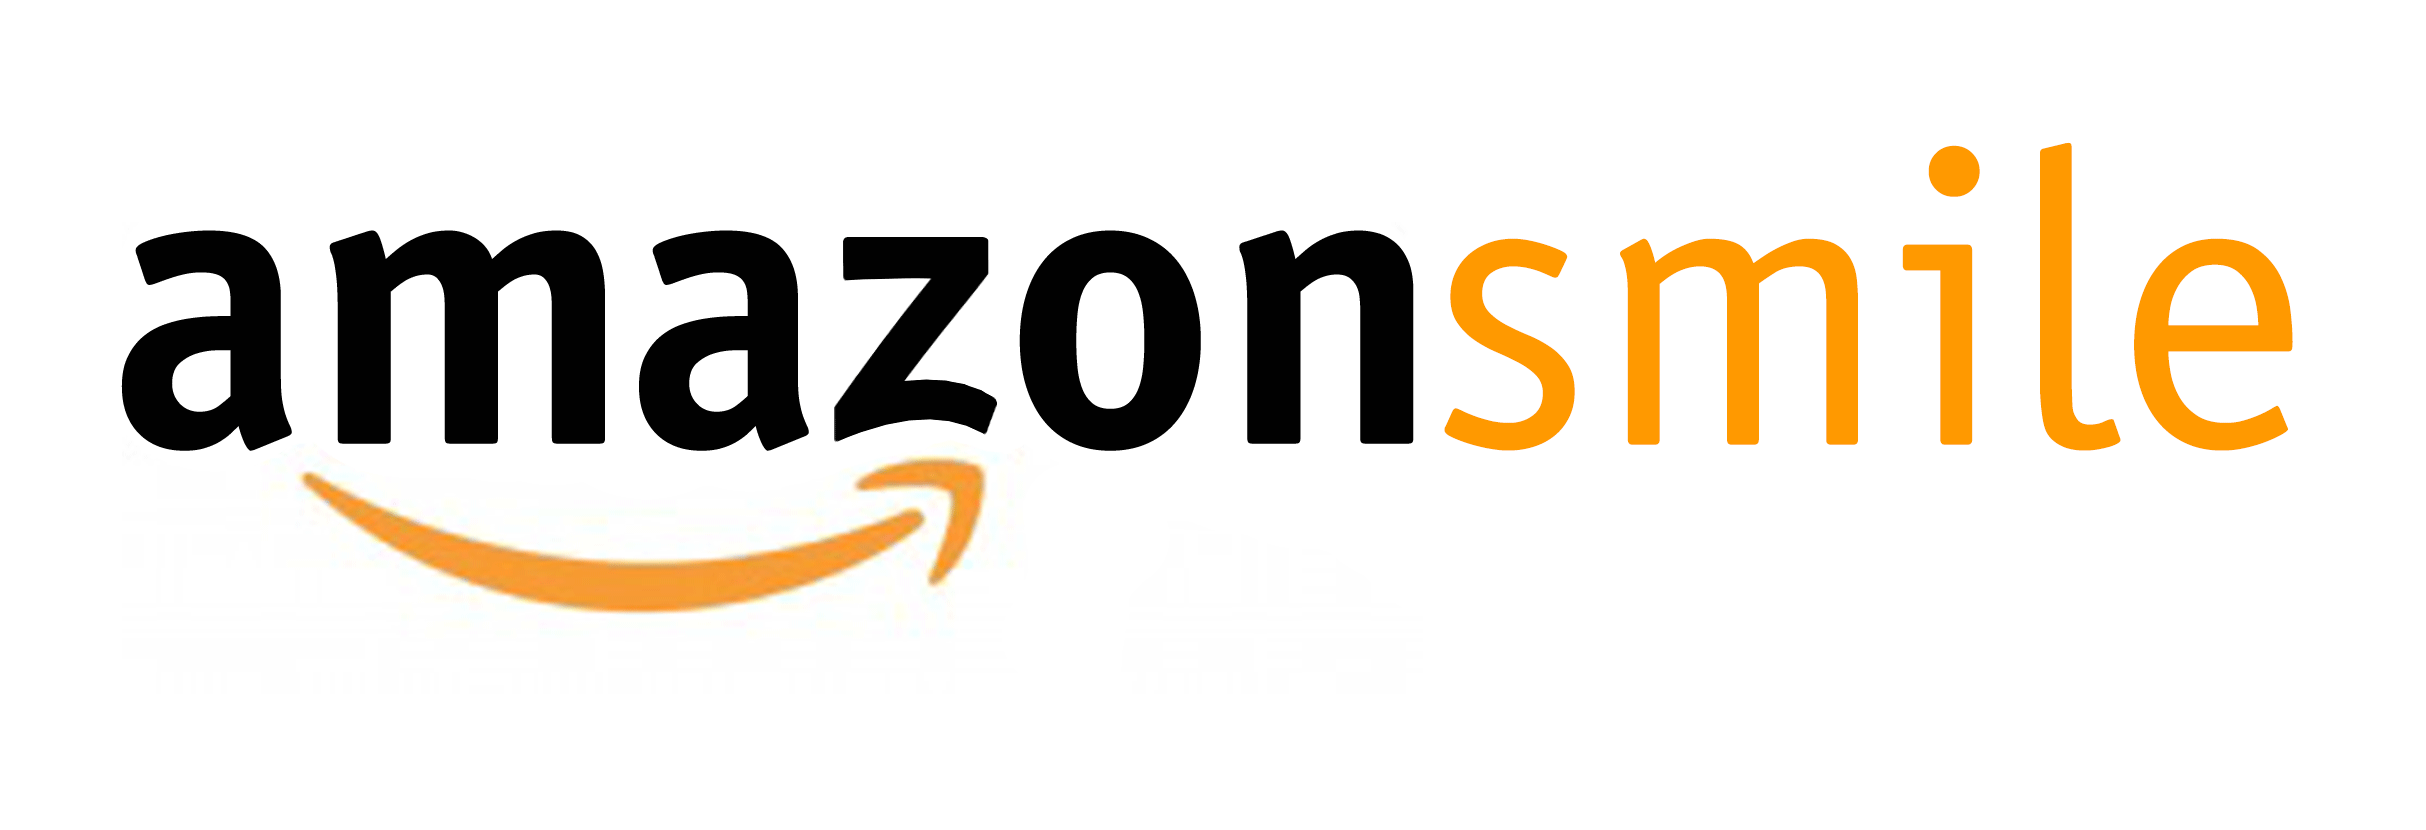 LSA Amazon Smile - Contribute Today | Linguistic Society of America